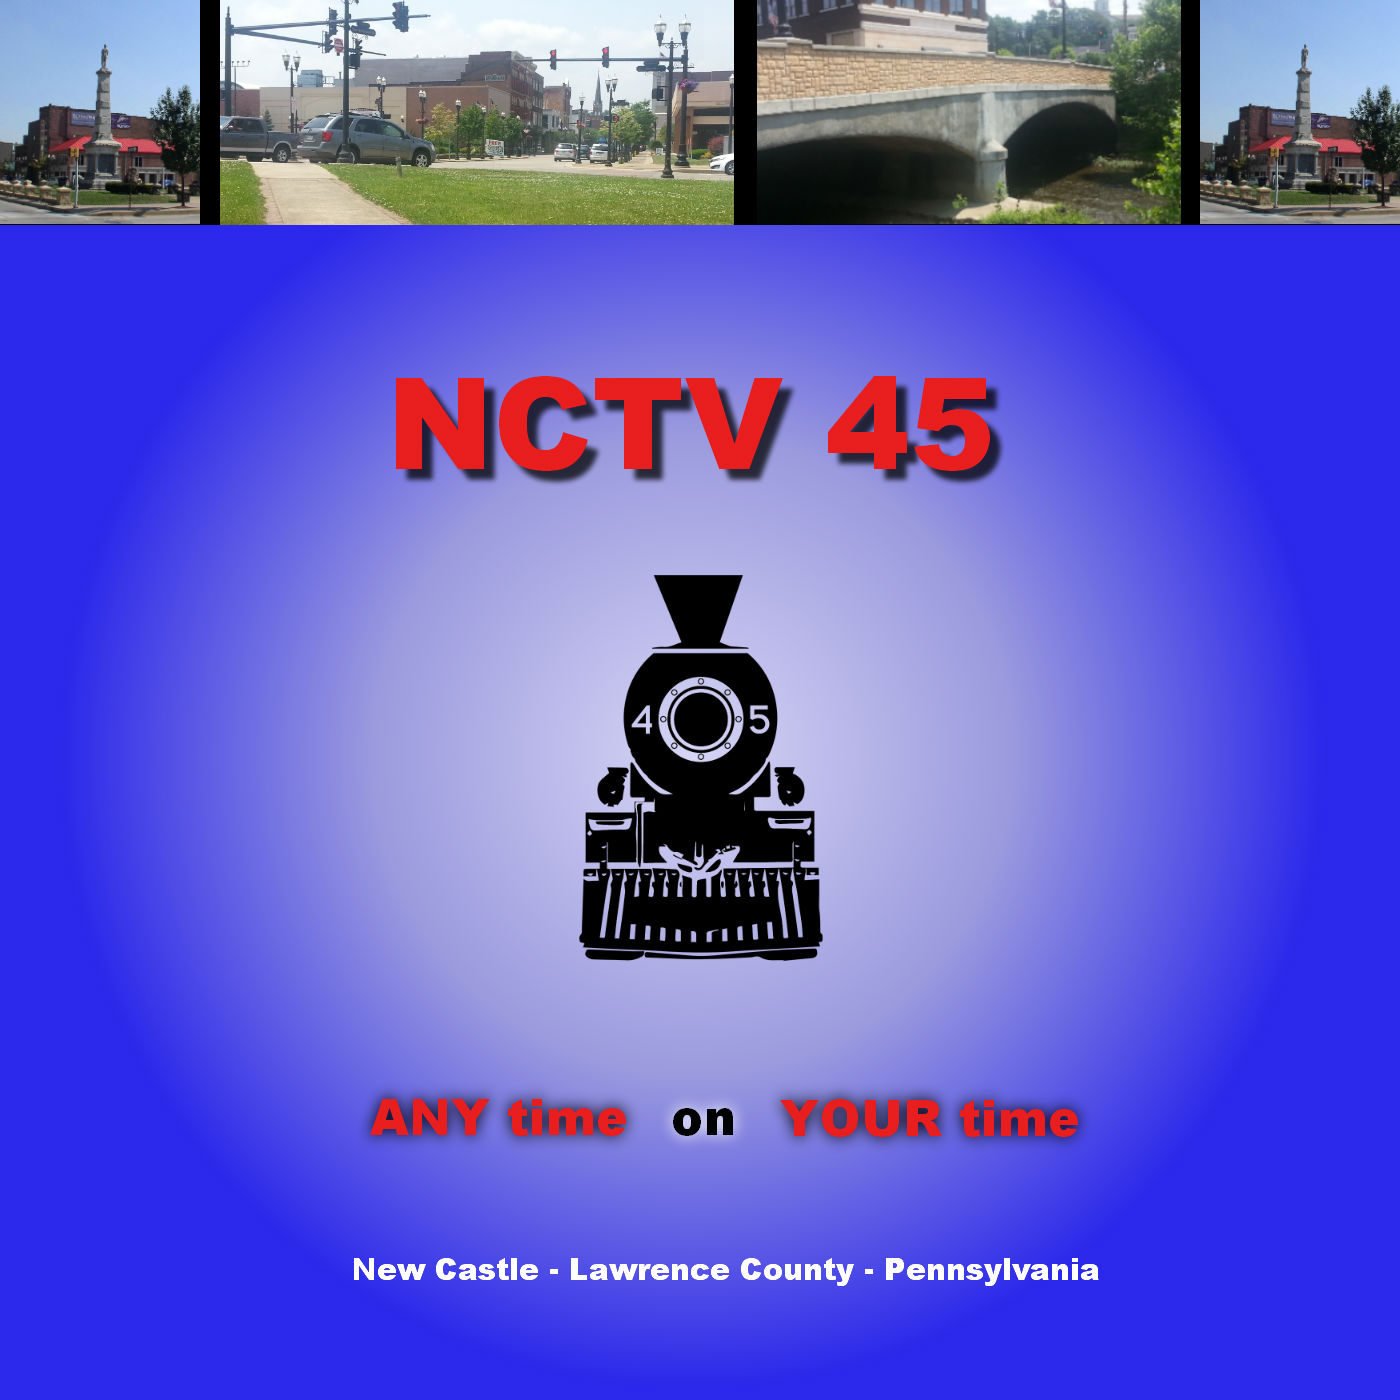 Artwork for NCTV45's Lawrence County Community Happenings June 16 Thru June 22 2019